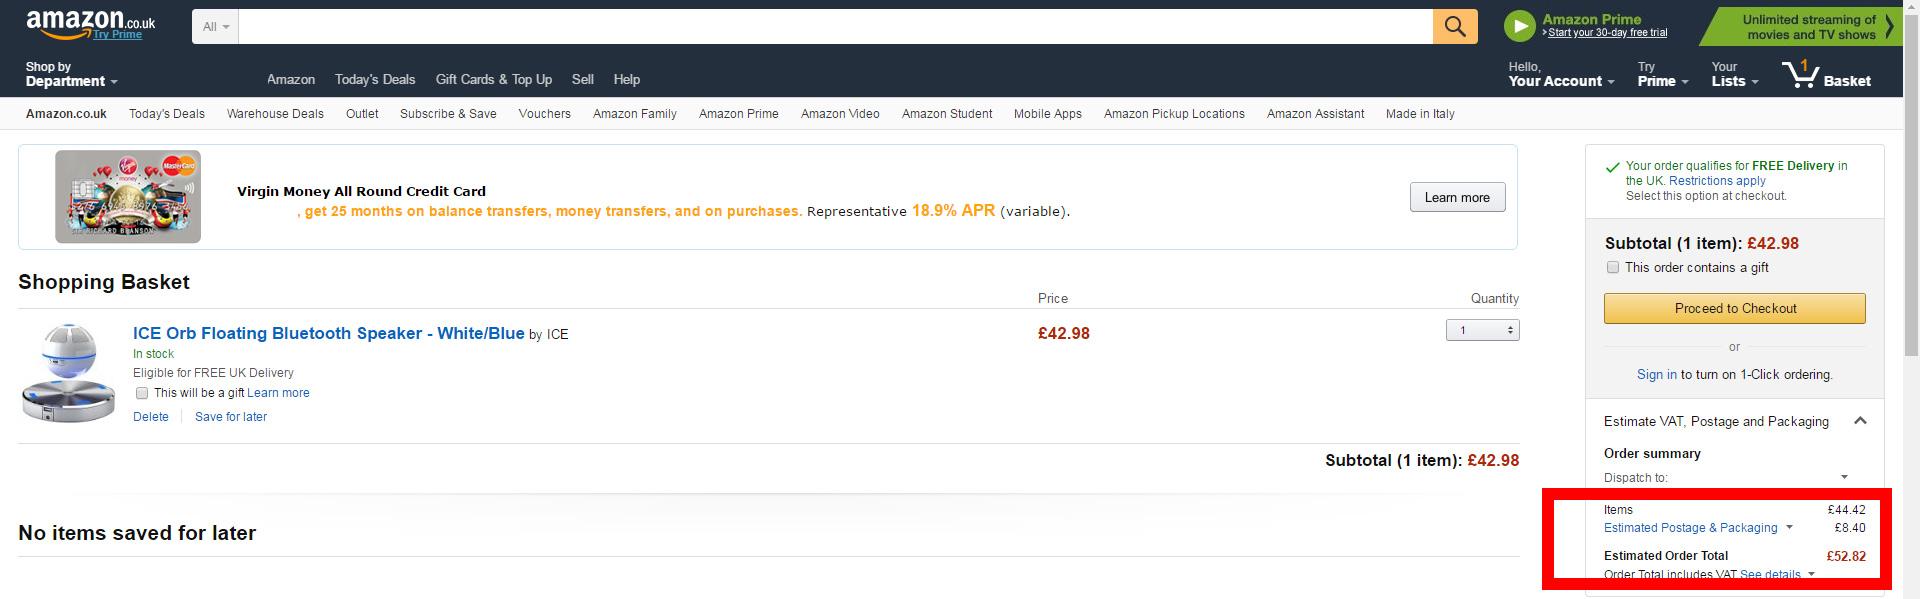 ice-orb-floating-bluetooth-speaker-amazon-co-uk-price